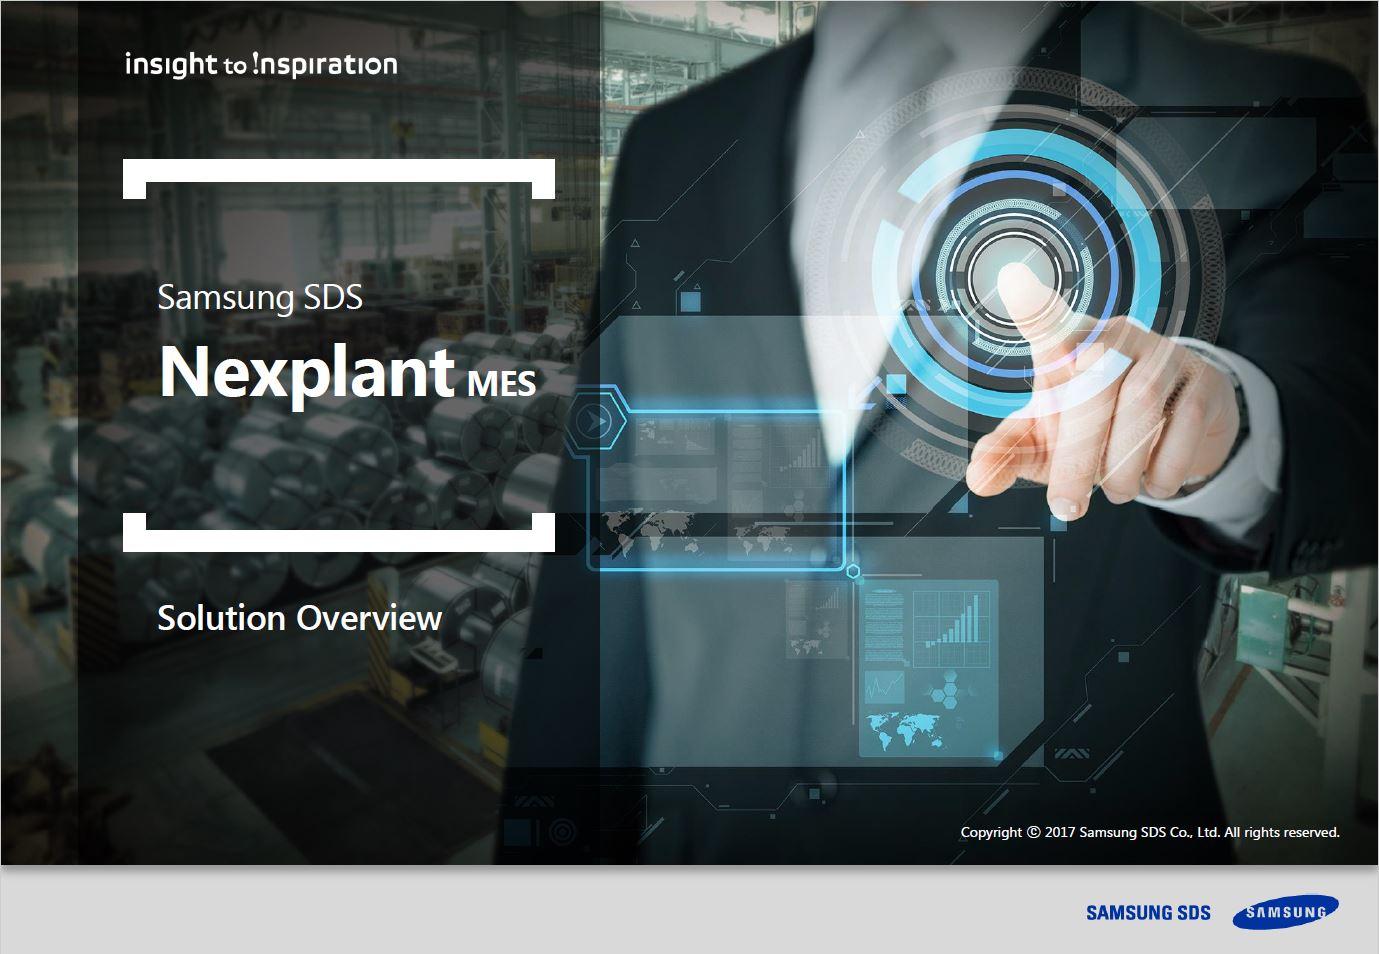 [Nexplant MES] Optimize your entire manufacturing process